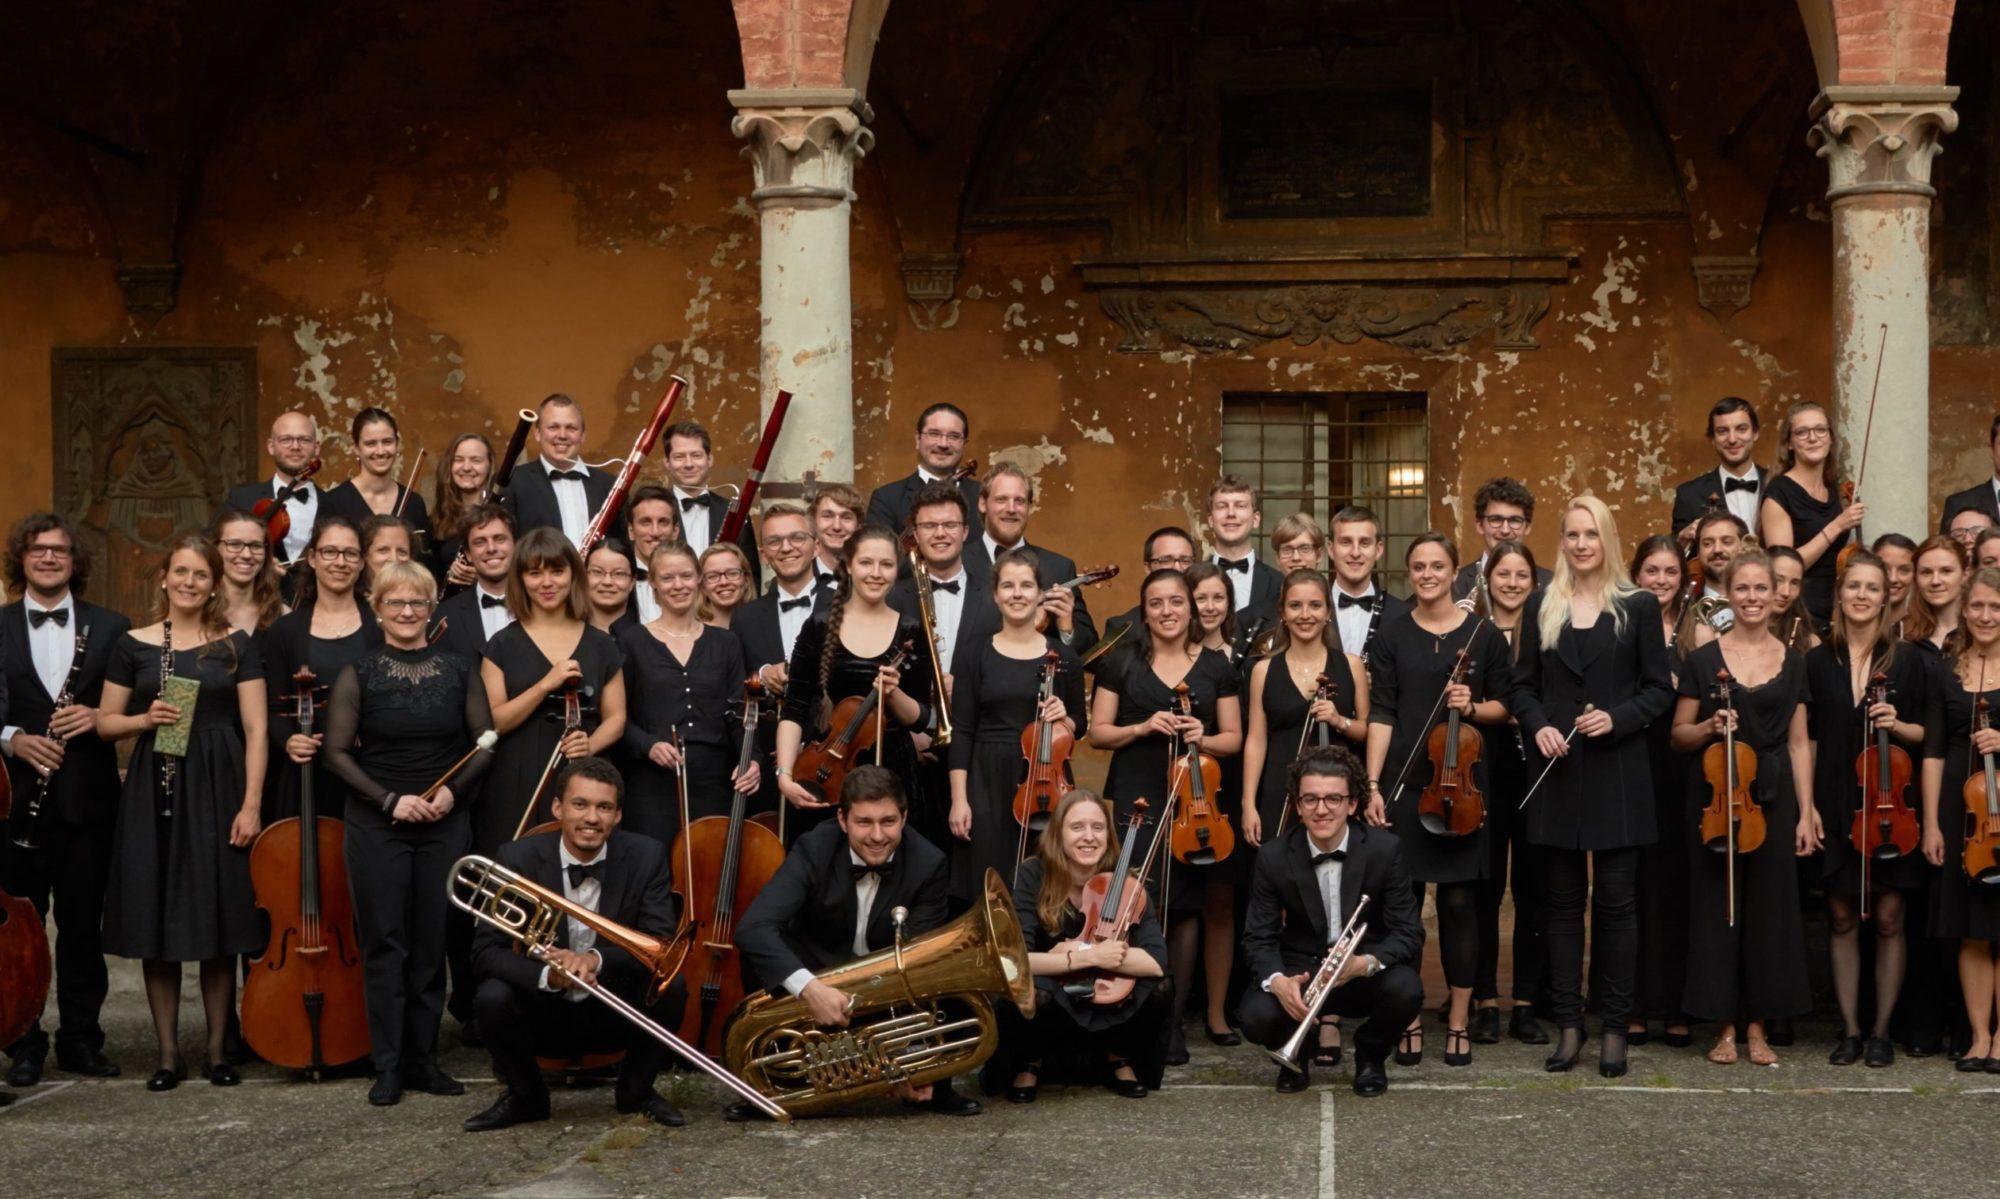 Uniorchester Bern